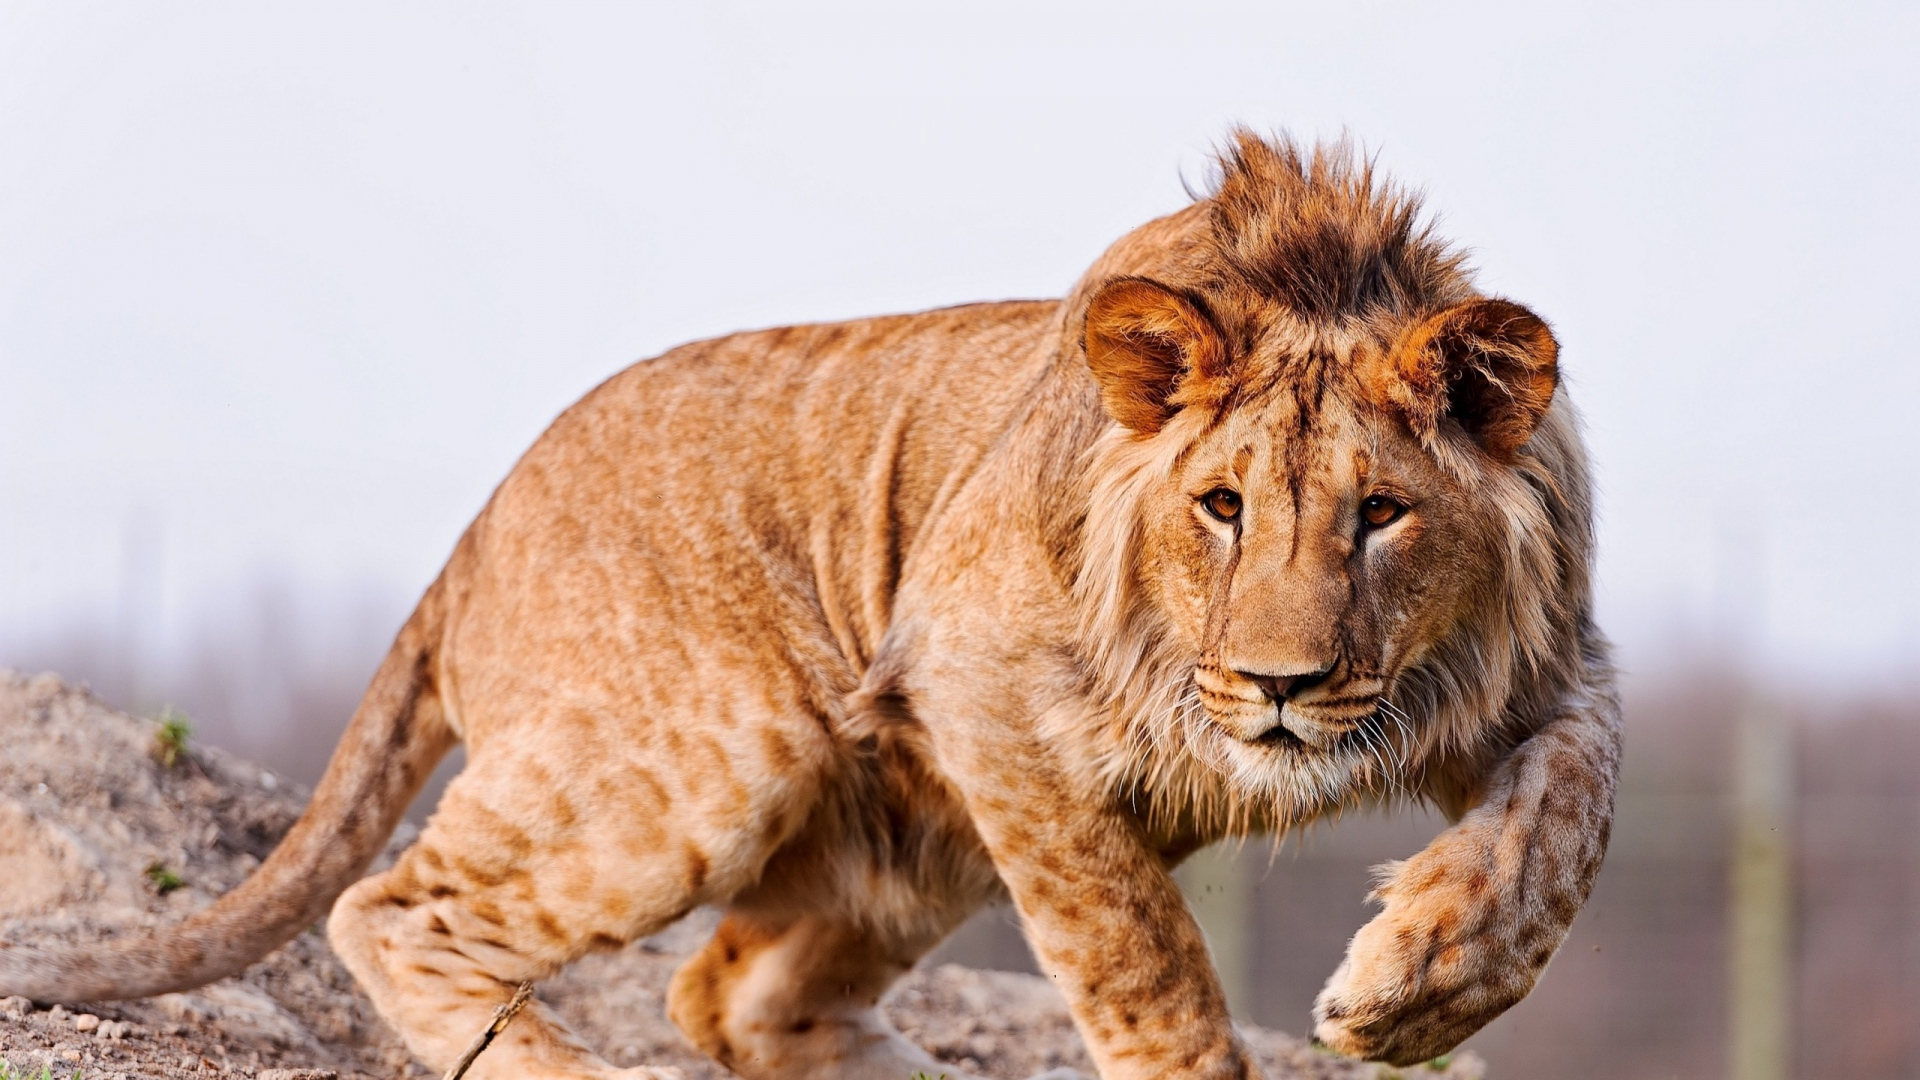 download wallpaper 1920x1080 lion, predator, big cat, grass full hd